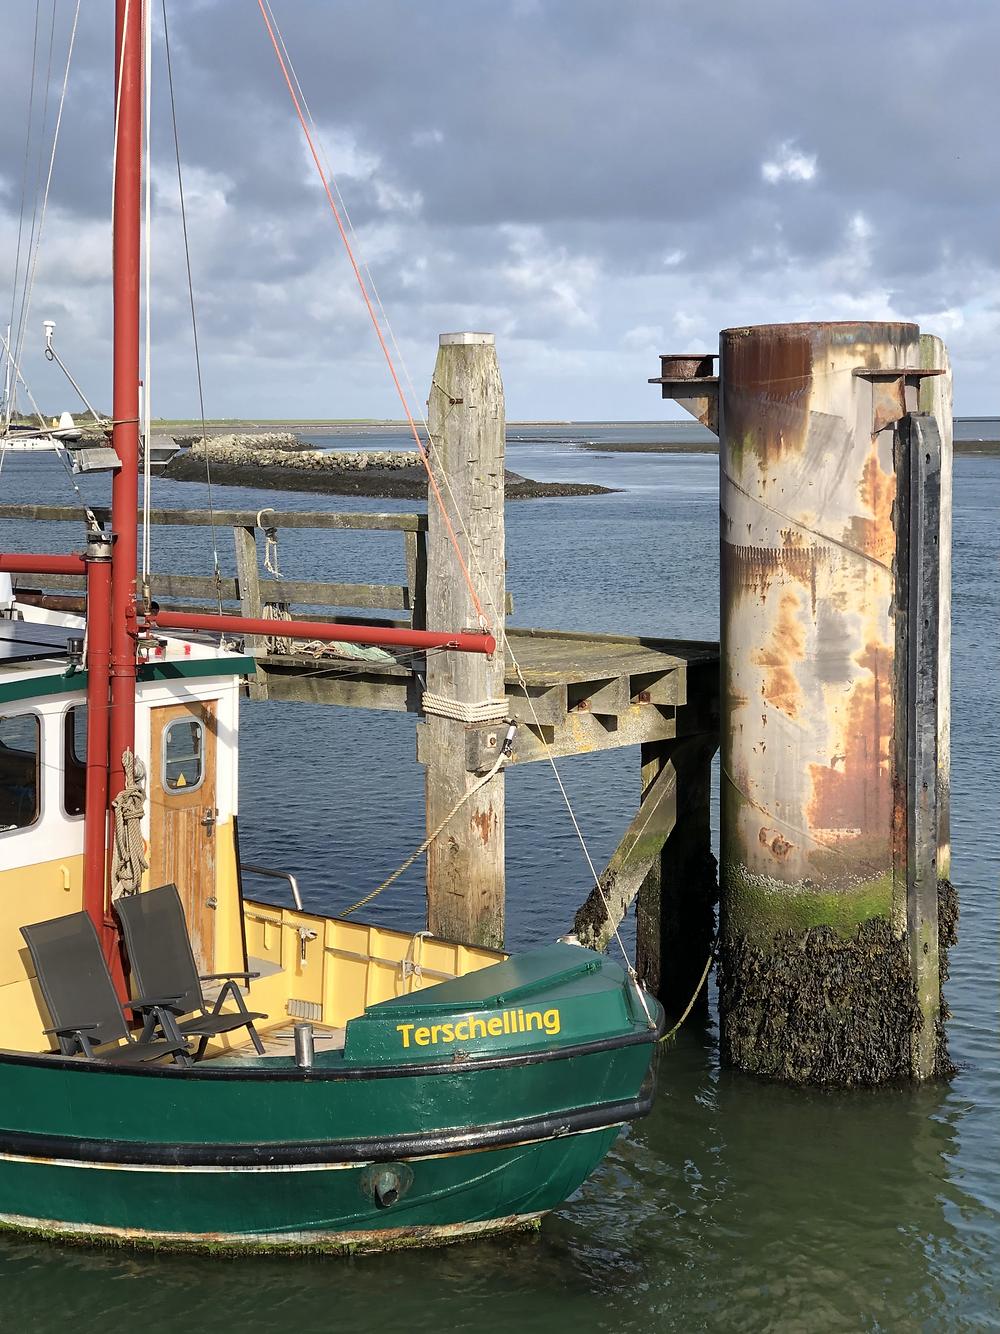 Boat Terschelling